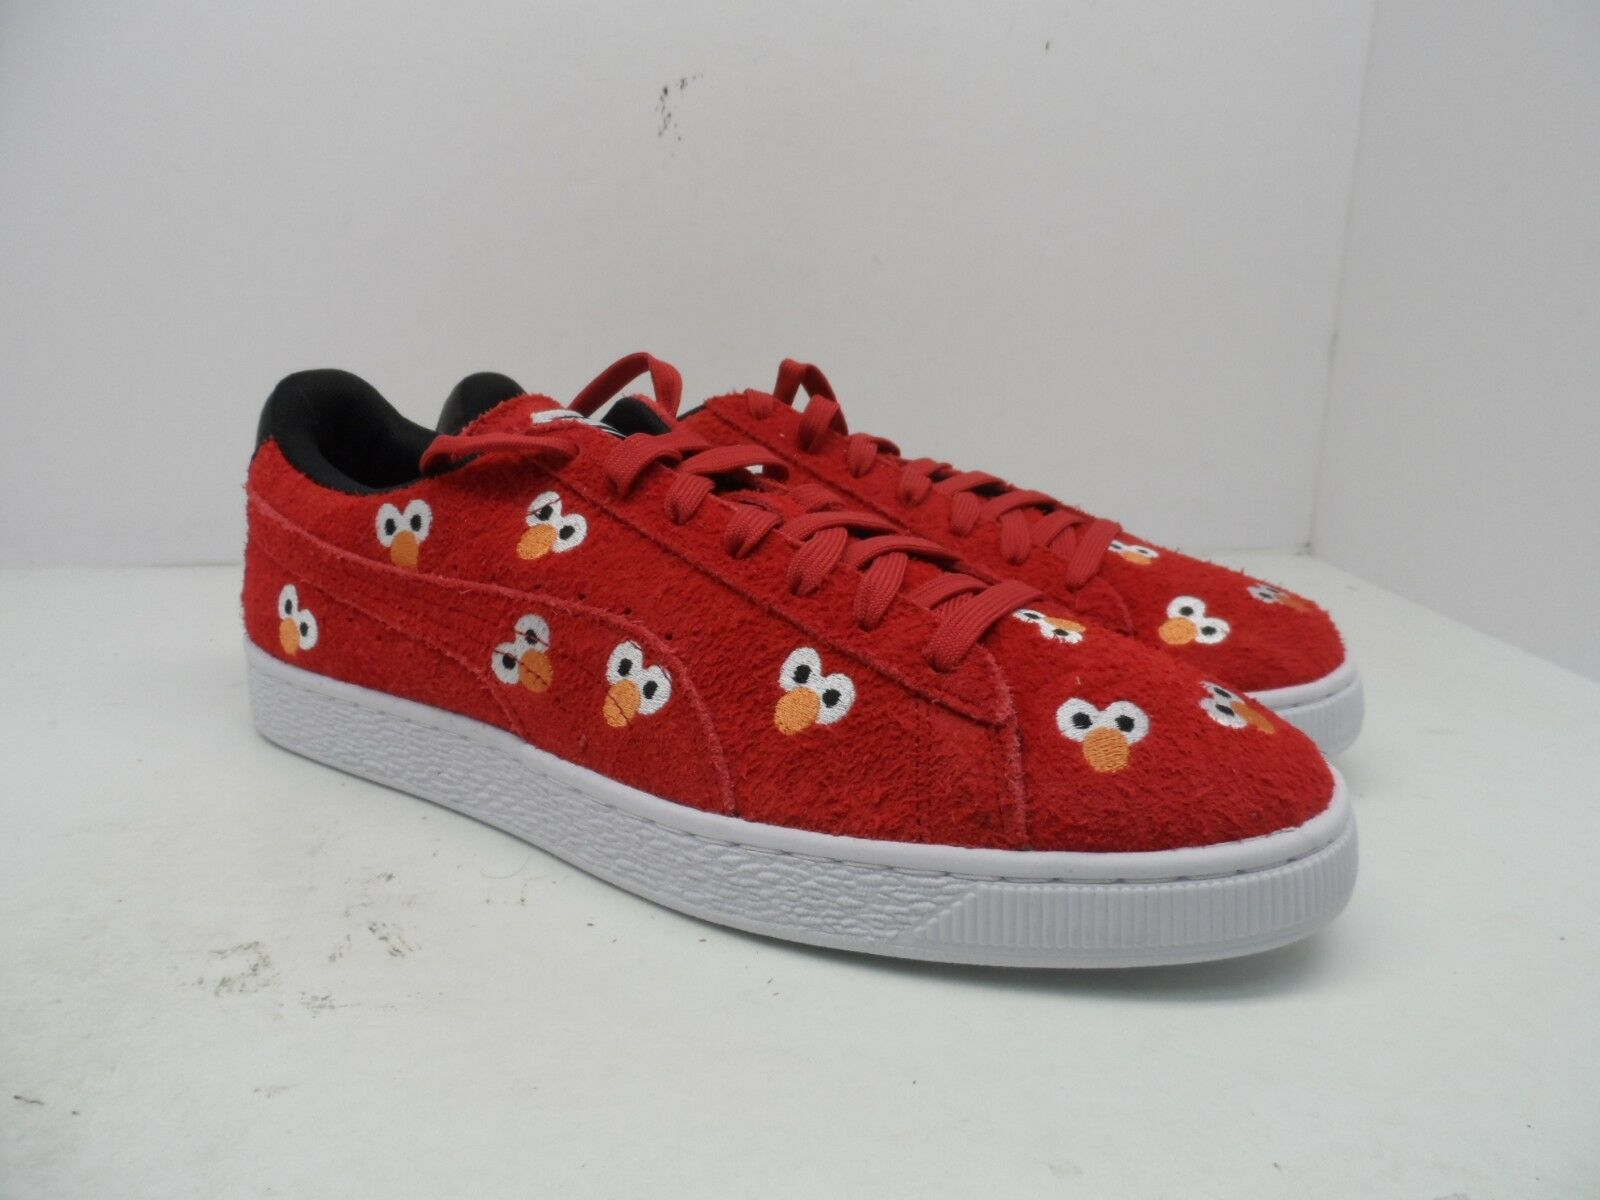 Puma Men's x Sesame Street Pack Classic ELMO Casual Shoe Red Size 12M